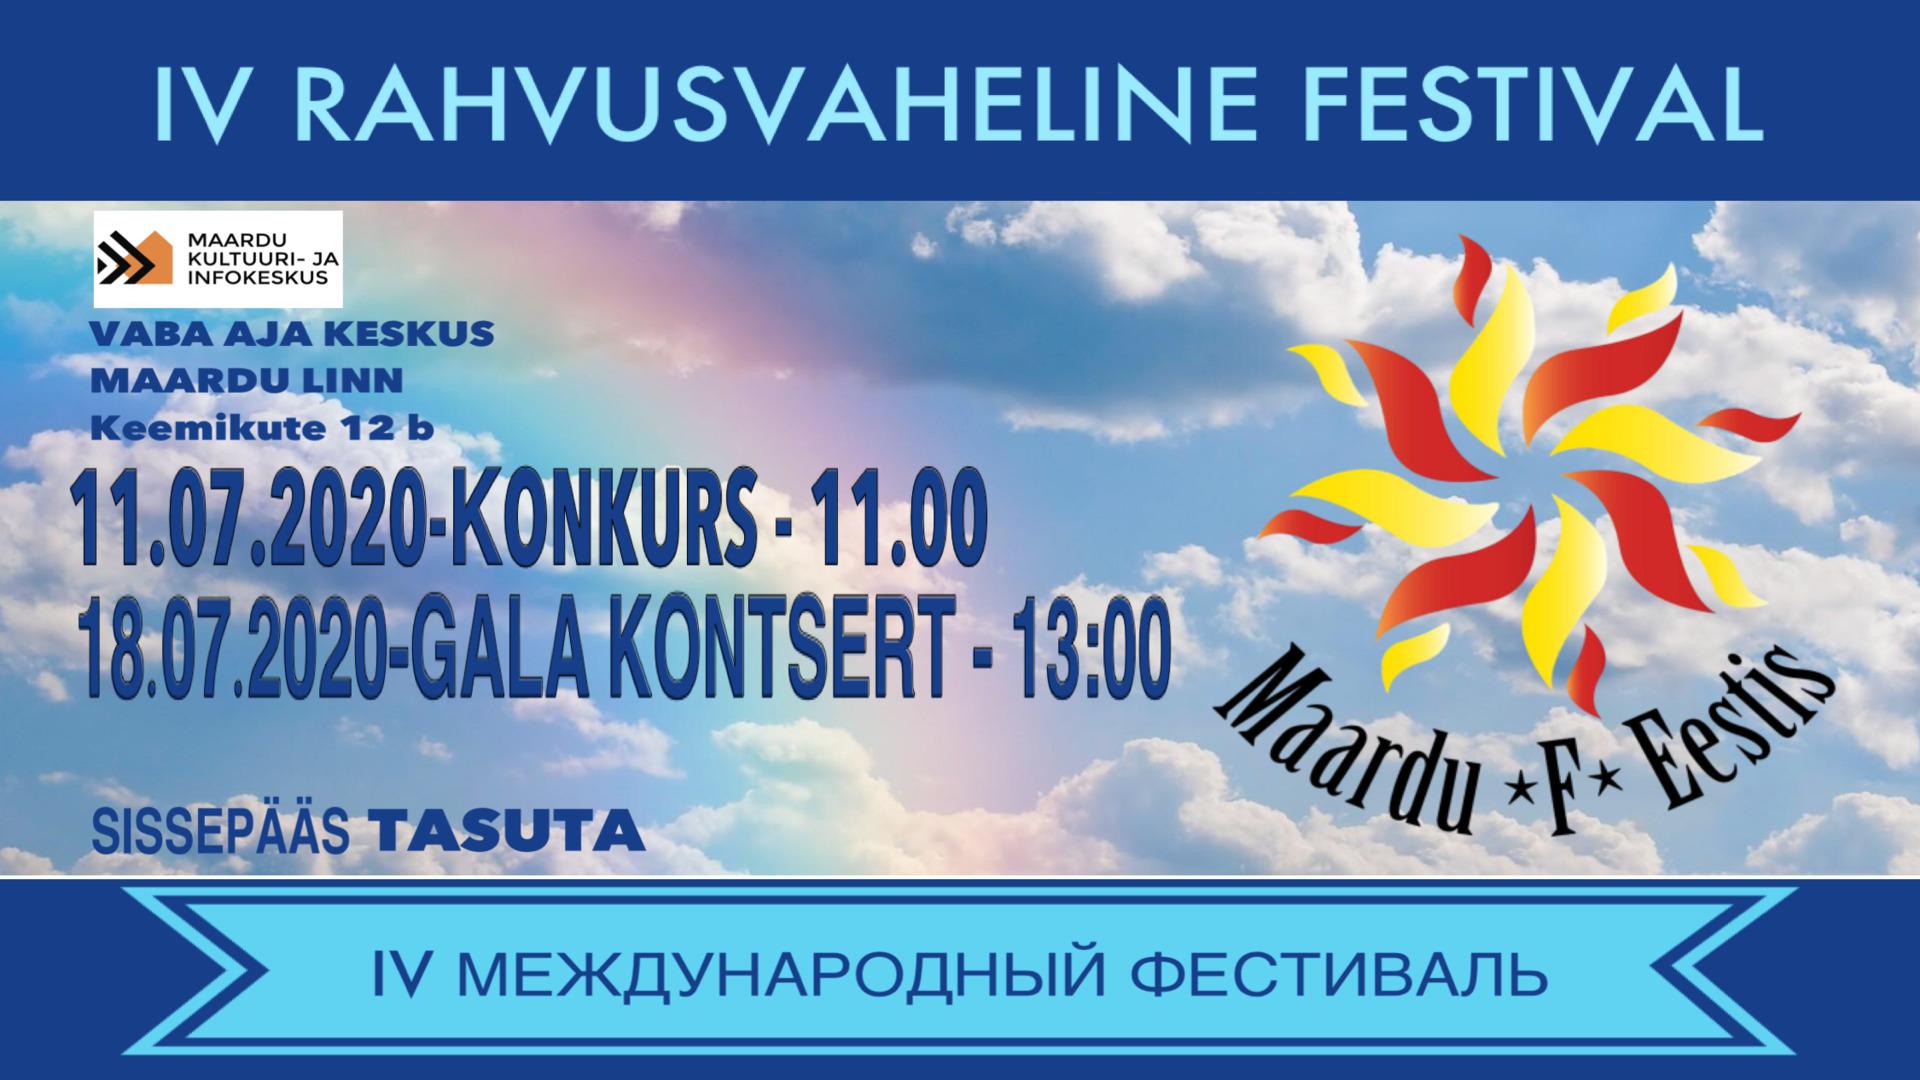 Rahvusvaheline festival Maardu F Eestis